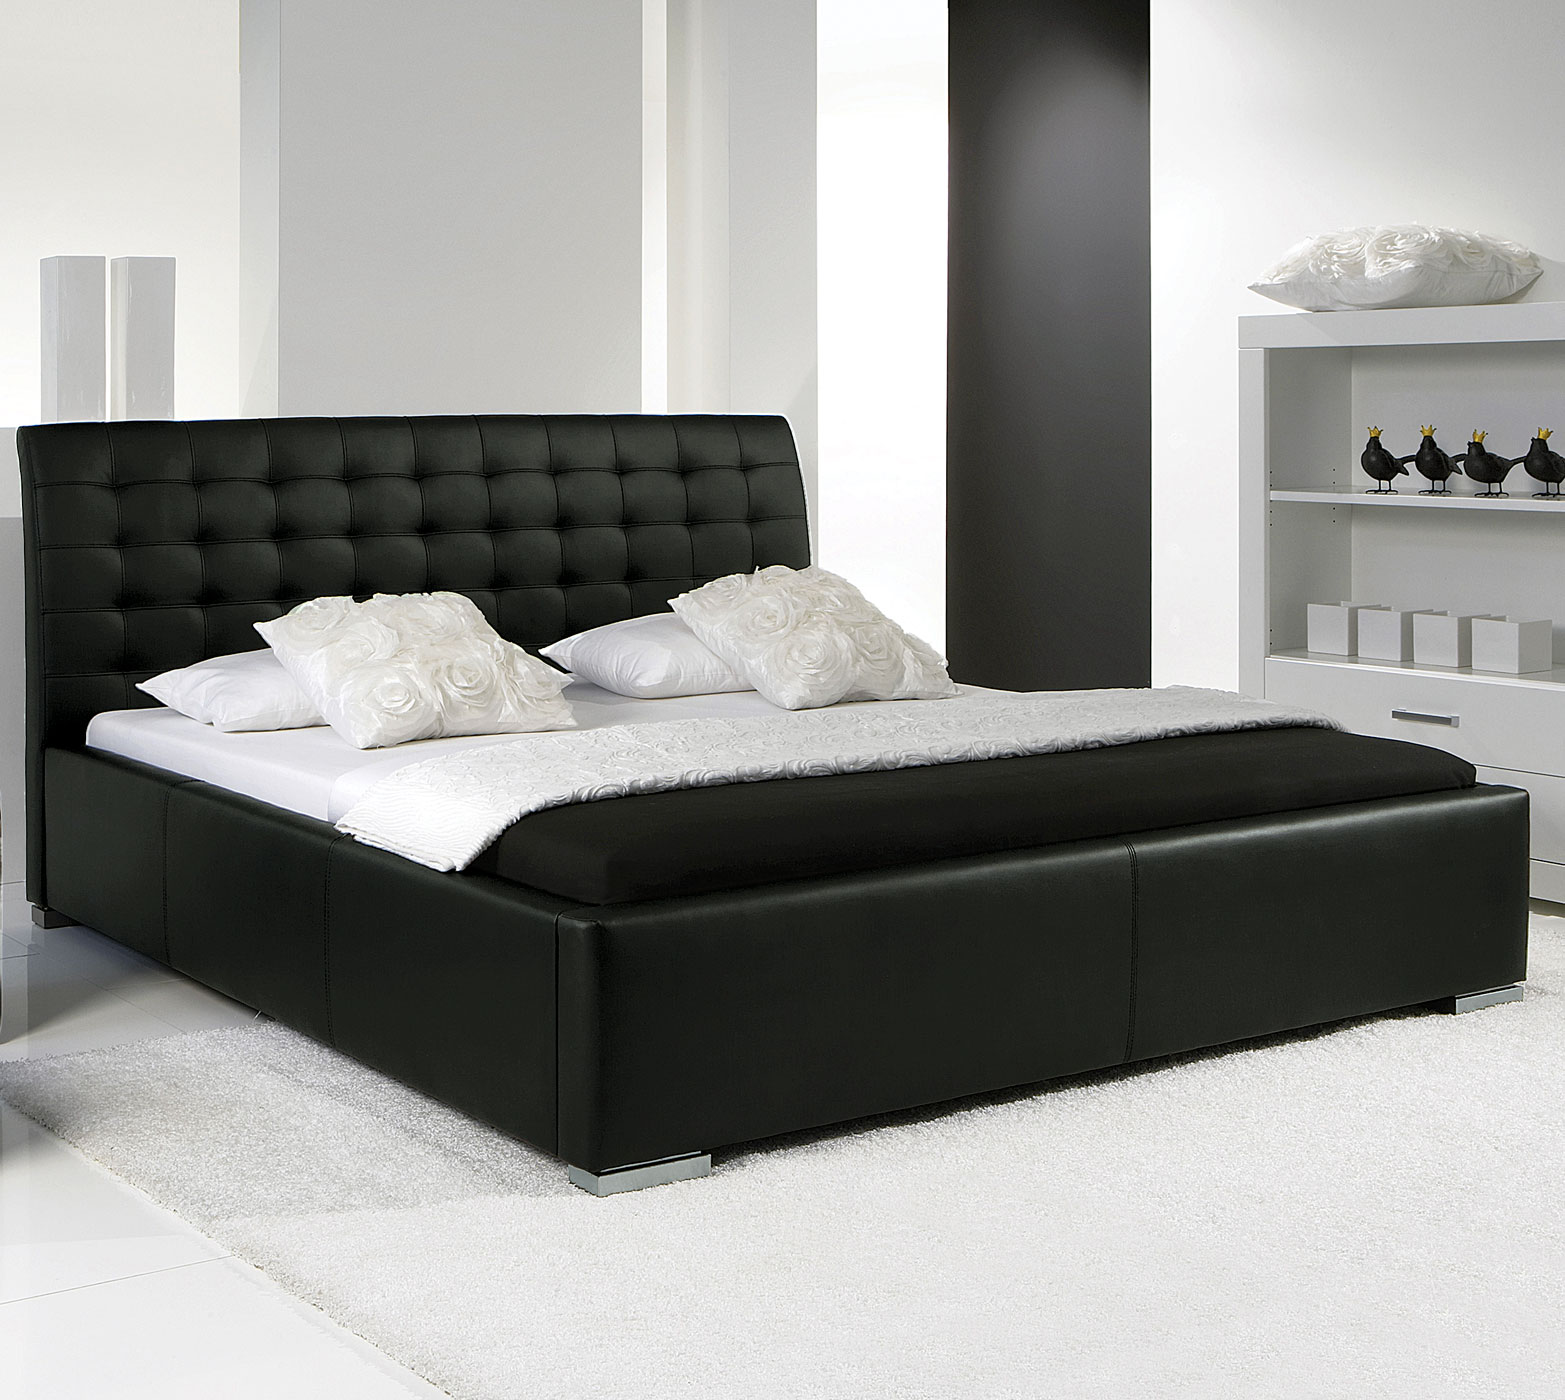 lederbett baskerville comfort z b auf rechnung bestellbar. Black Bedroom Furniture Sets. Home Design Ideas